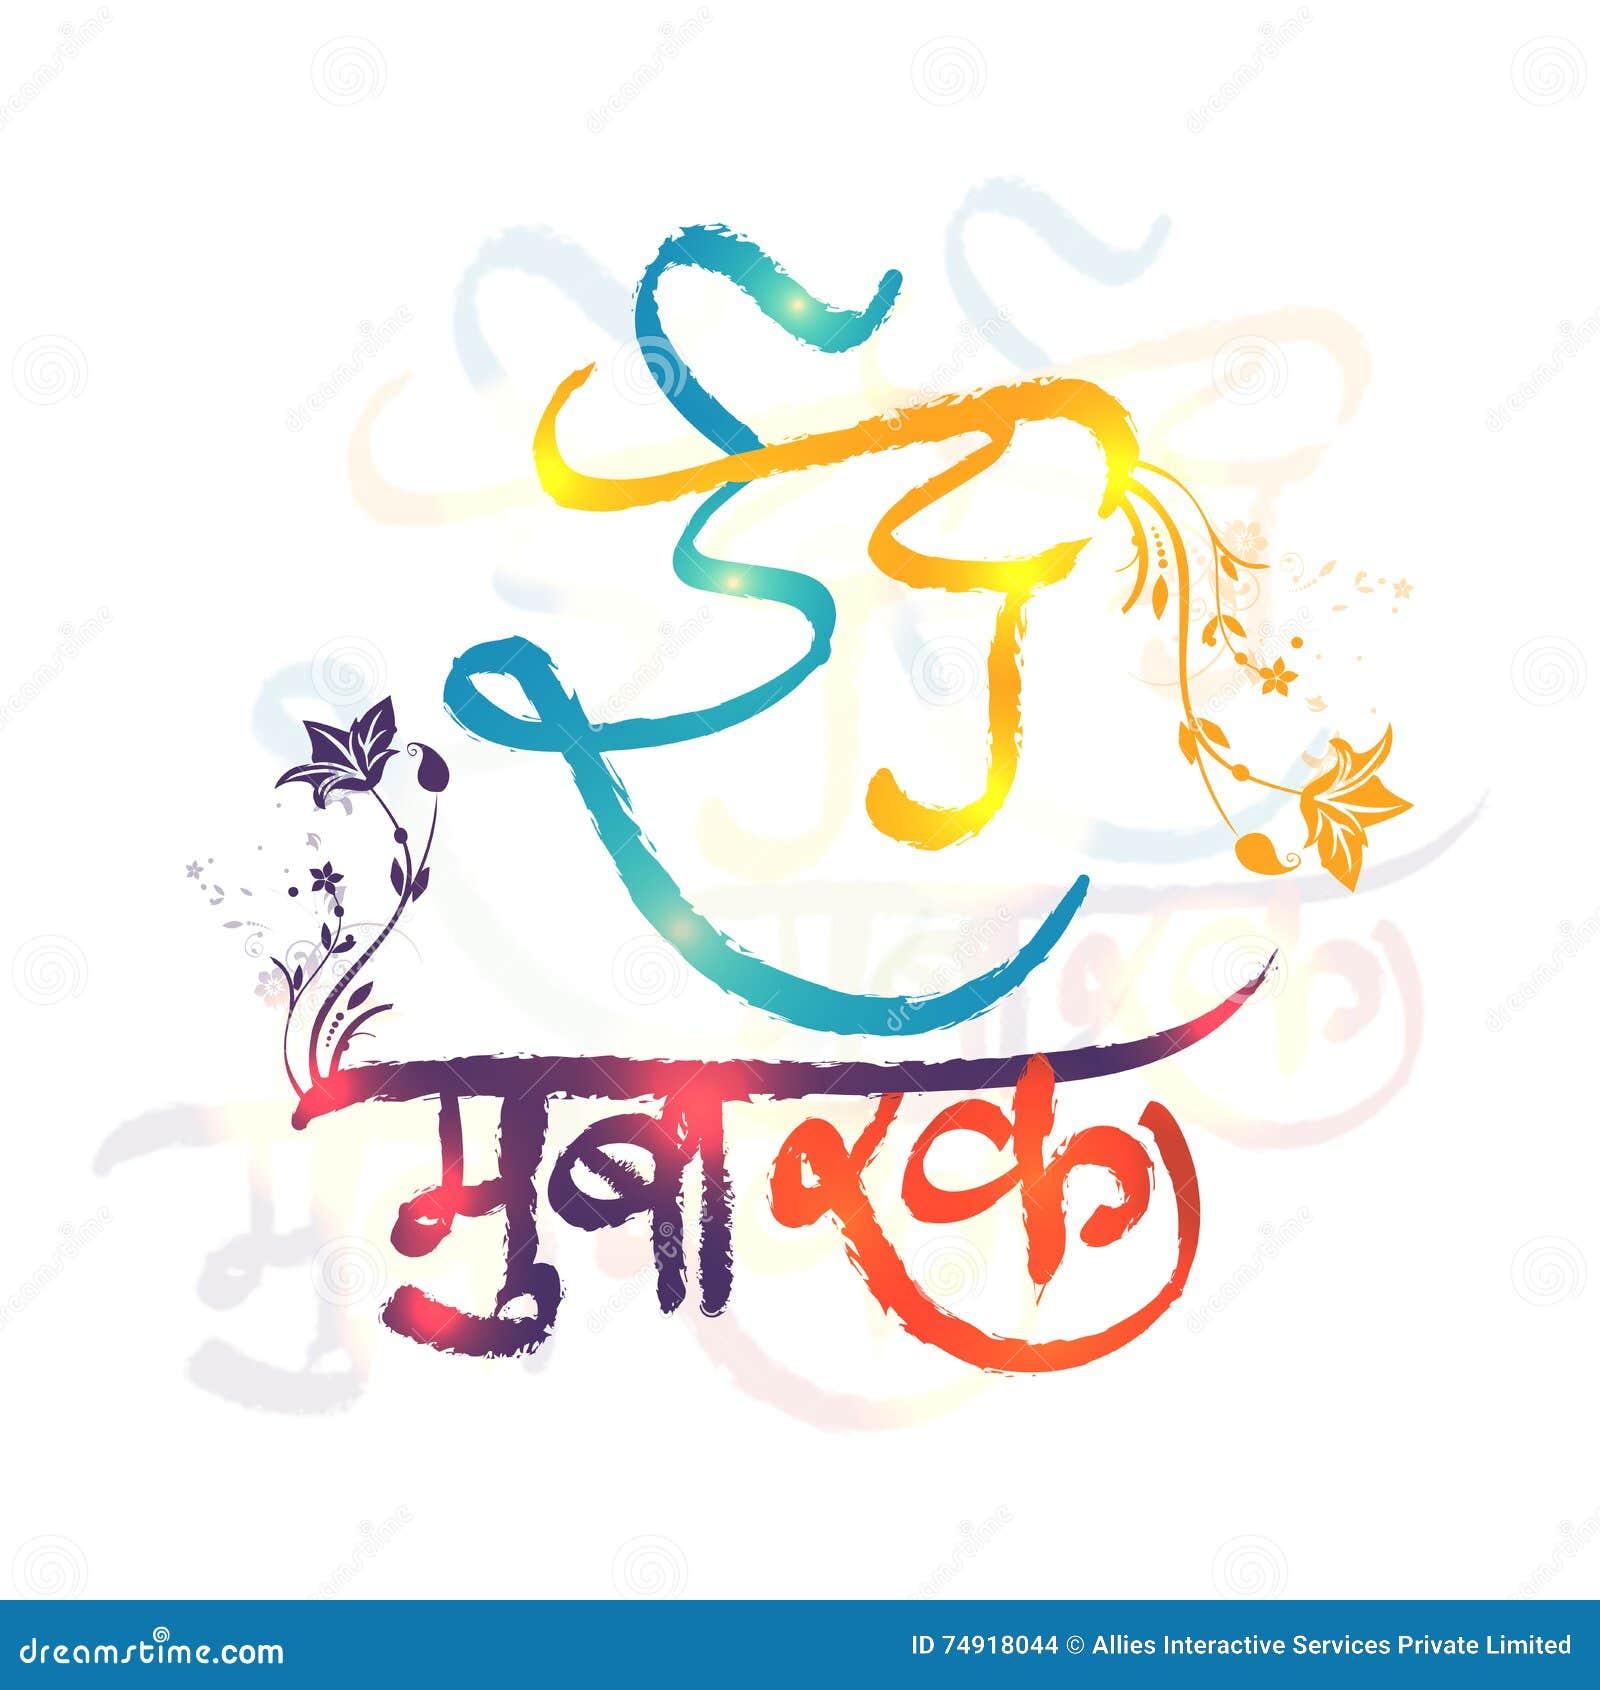 Greeting card with hindi text for eid mubarak stock illustration greeting card with hindi text for eid mubarak kristyandbryce Image collections